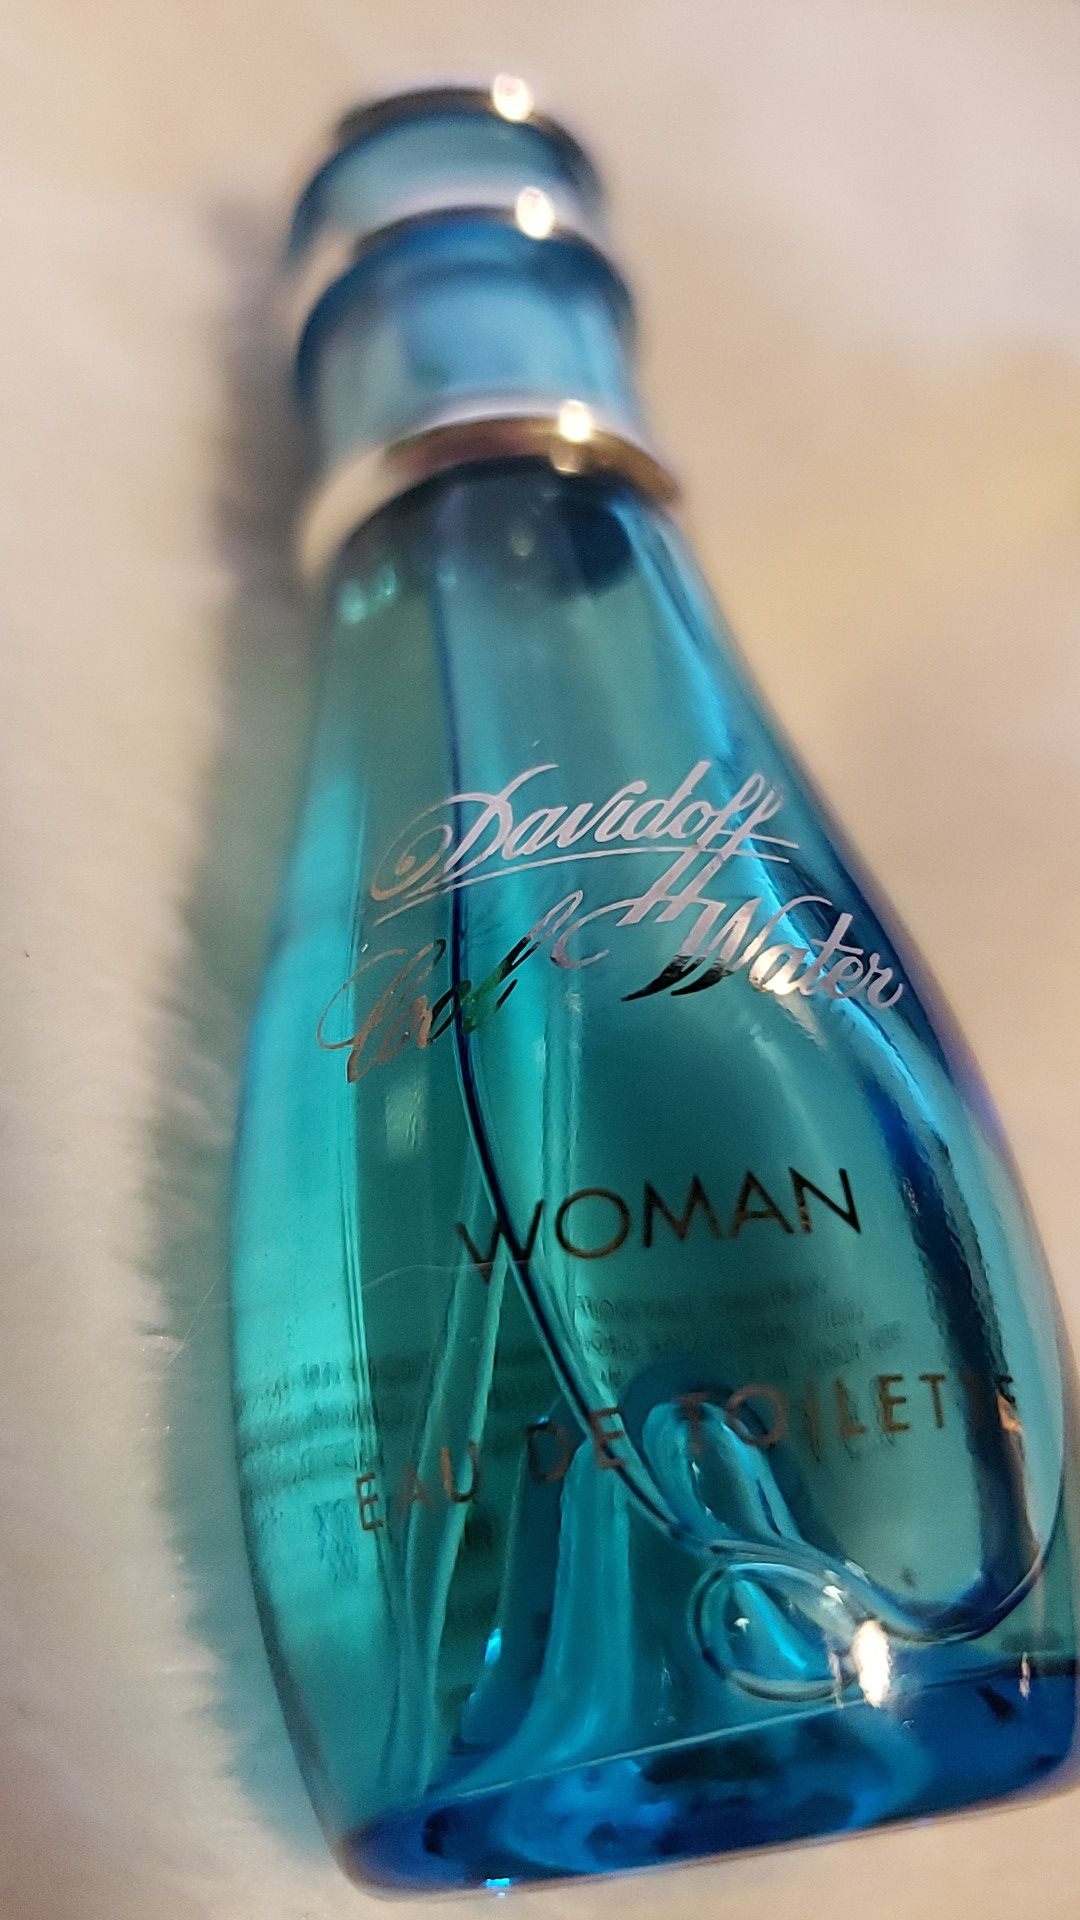 Davidoff cool water women's perfume mini